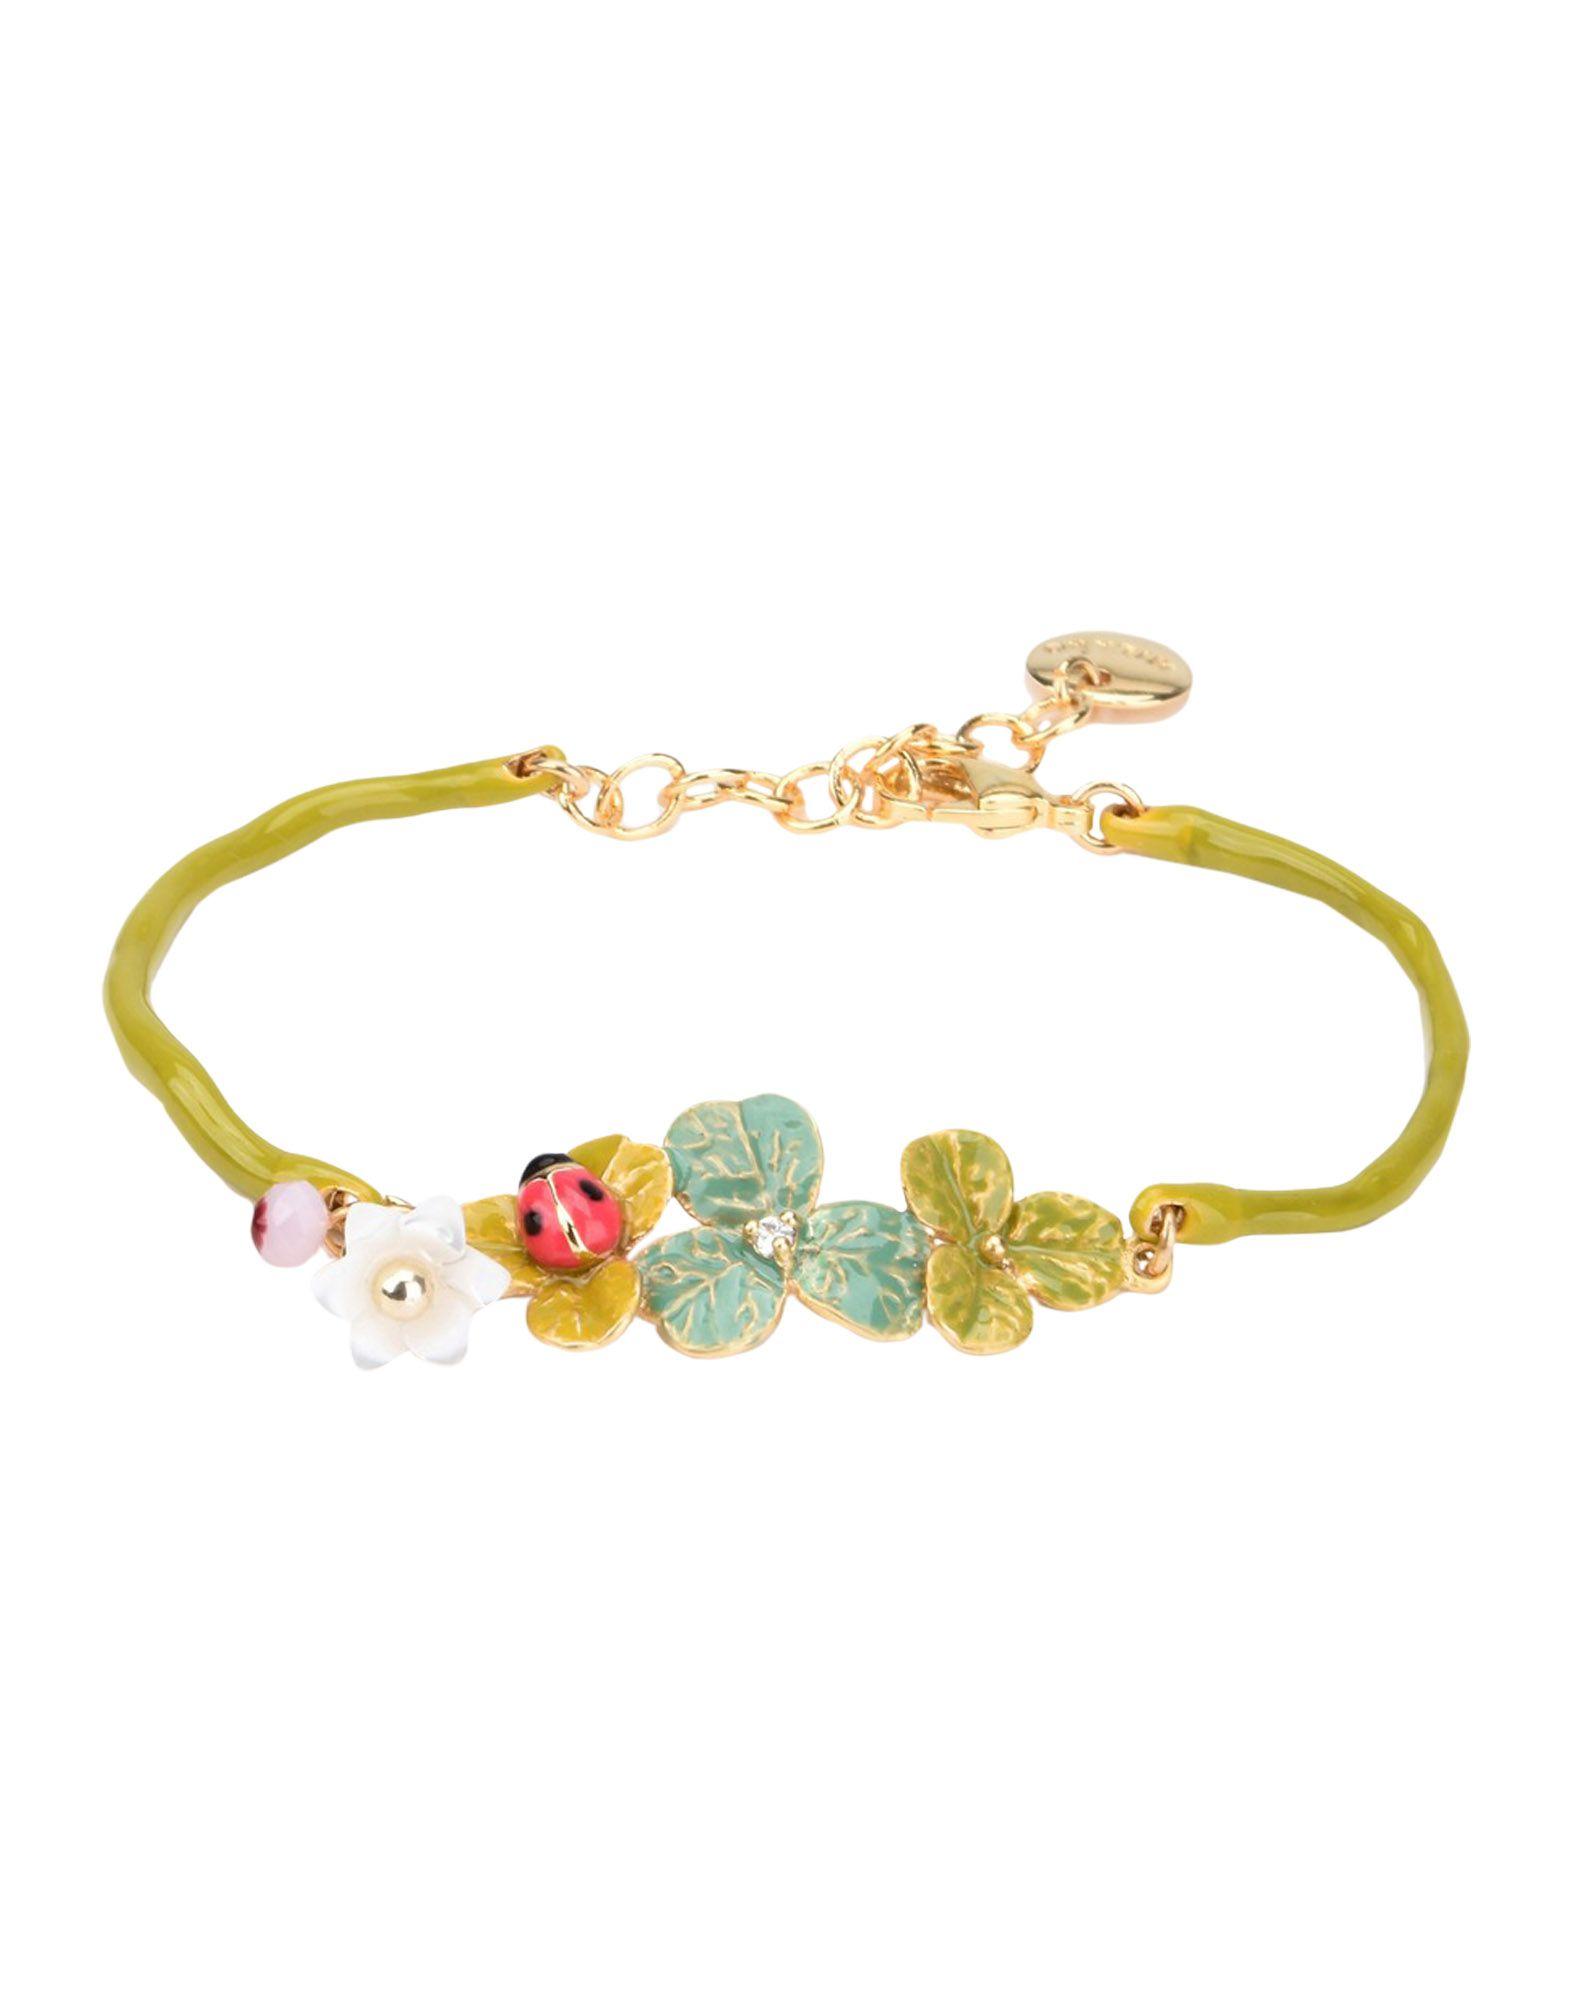 LA HORMIGA JEWELRY - Bracelets su YOOX.COM ARFvp